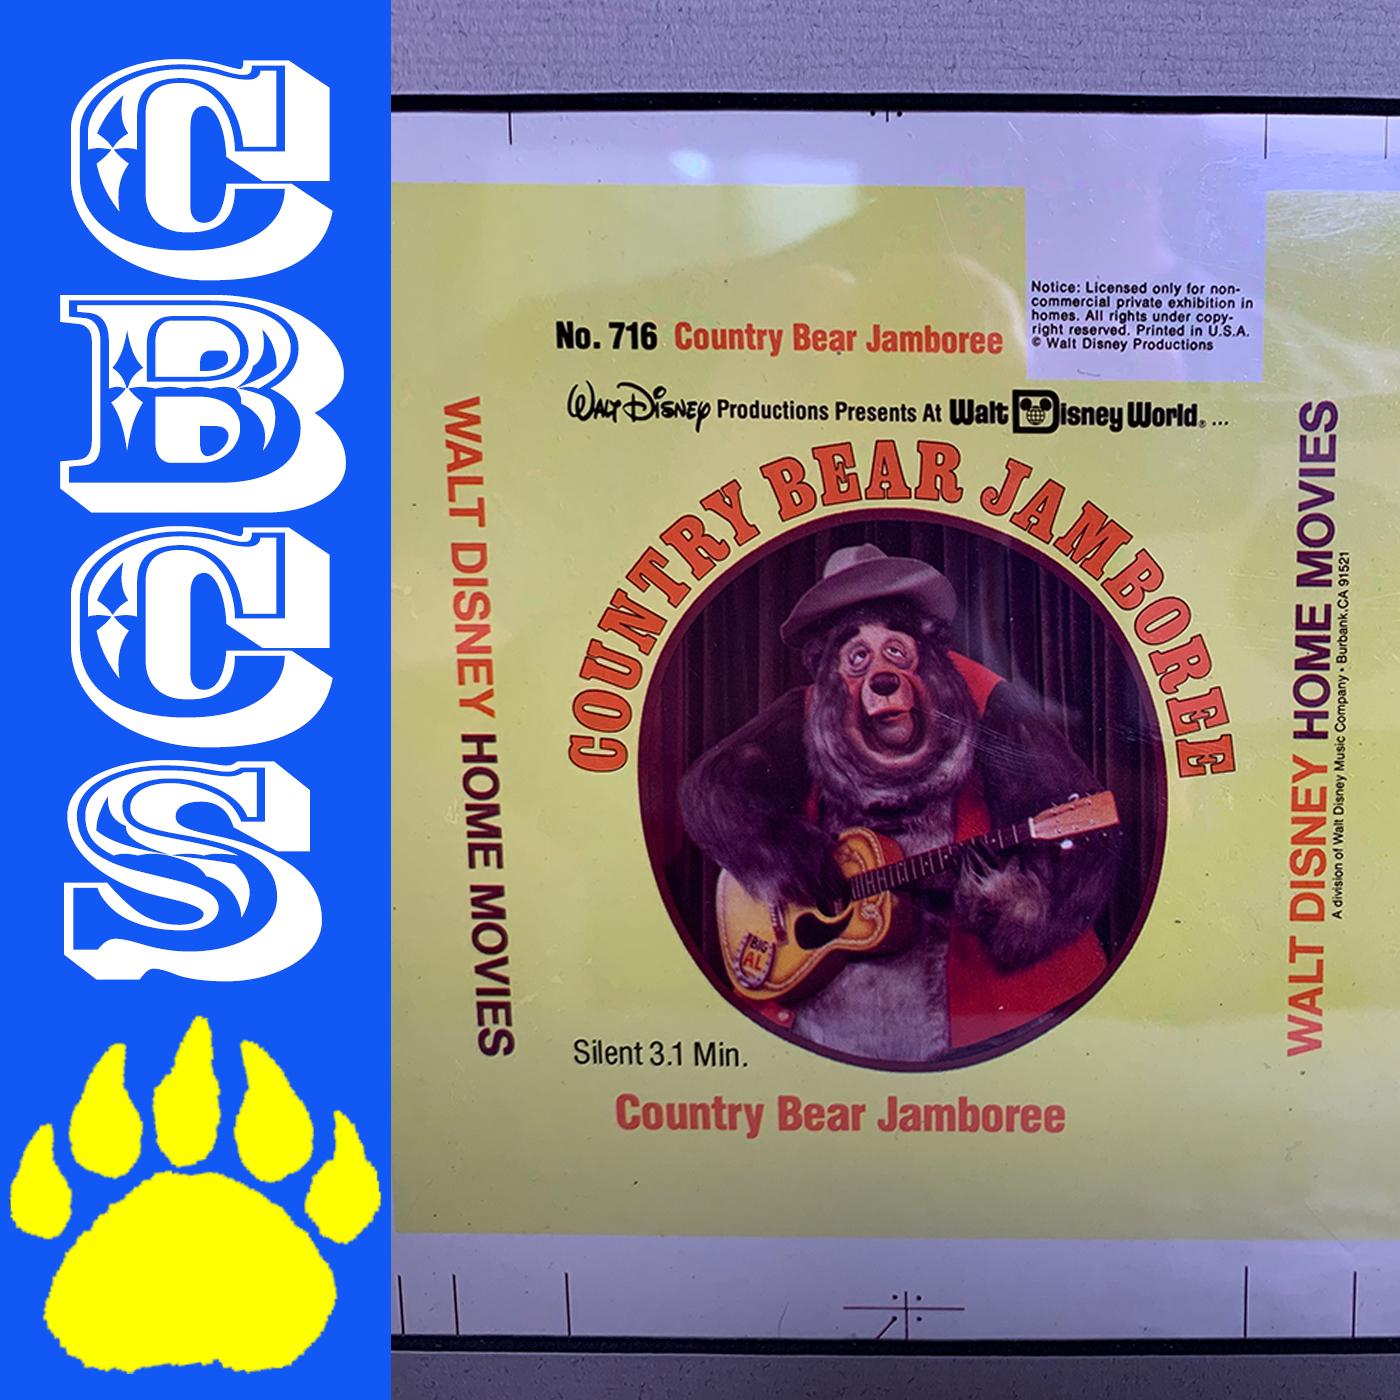 Artwork for Vintage Walt Disney World Film Cover Color Separation - Country Bear Collector Show #211